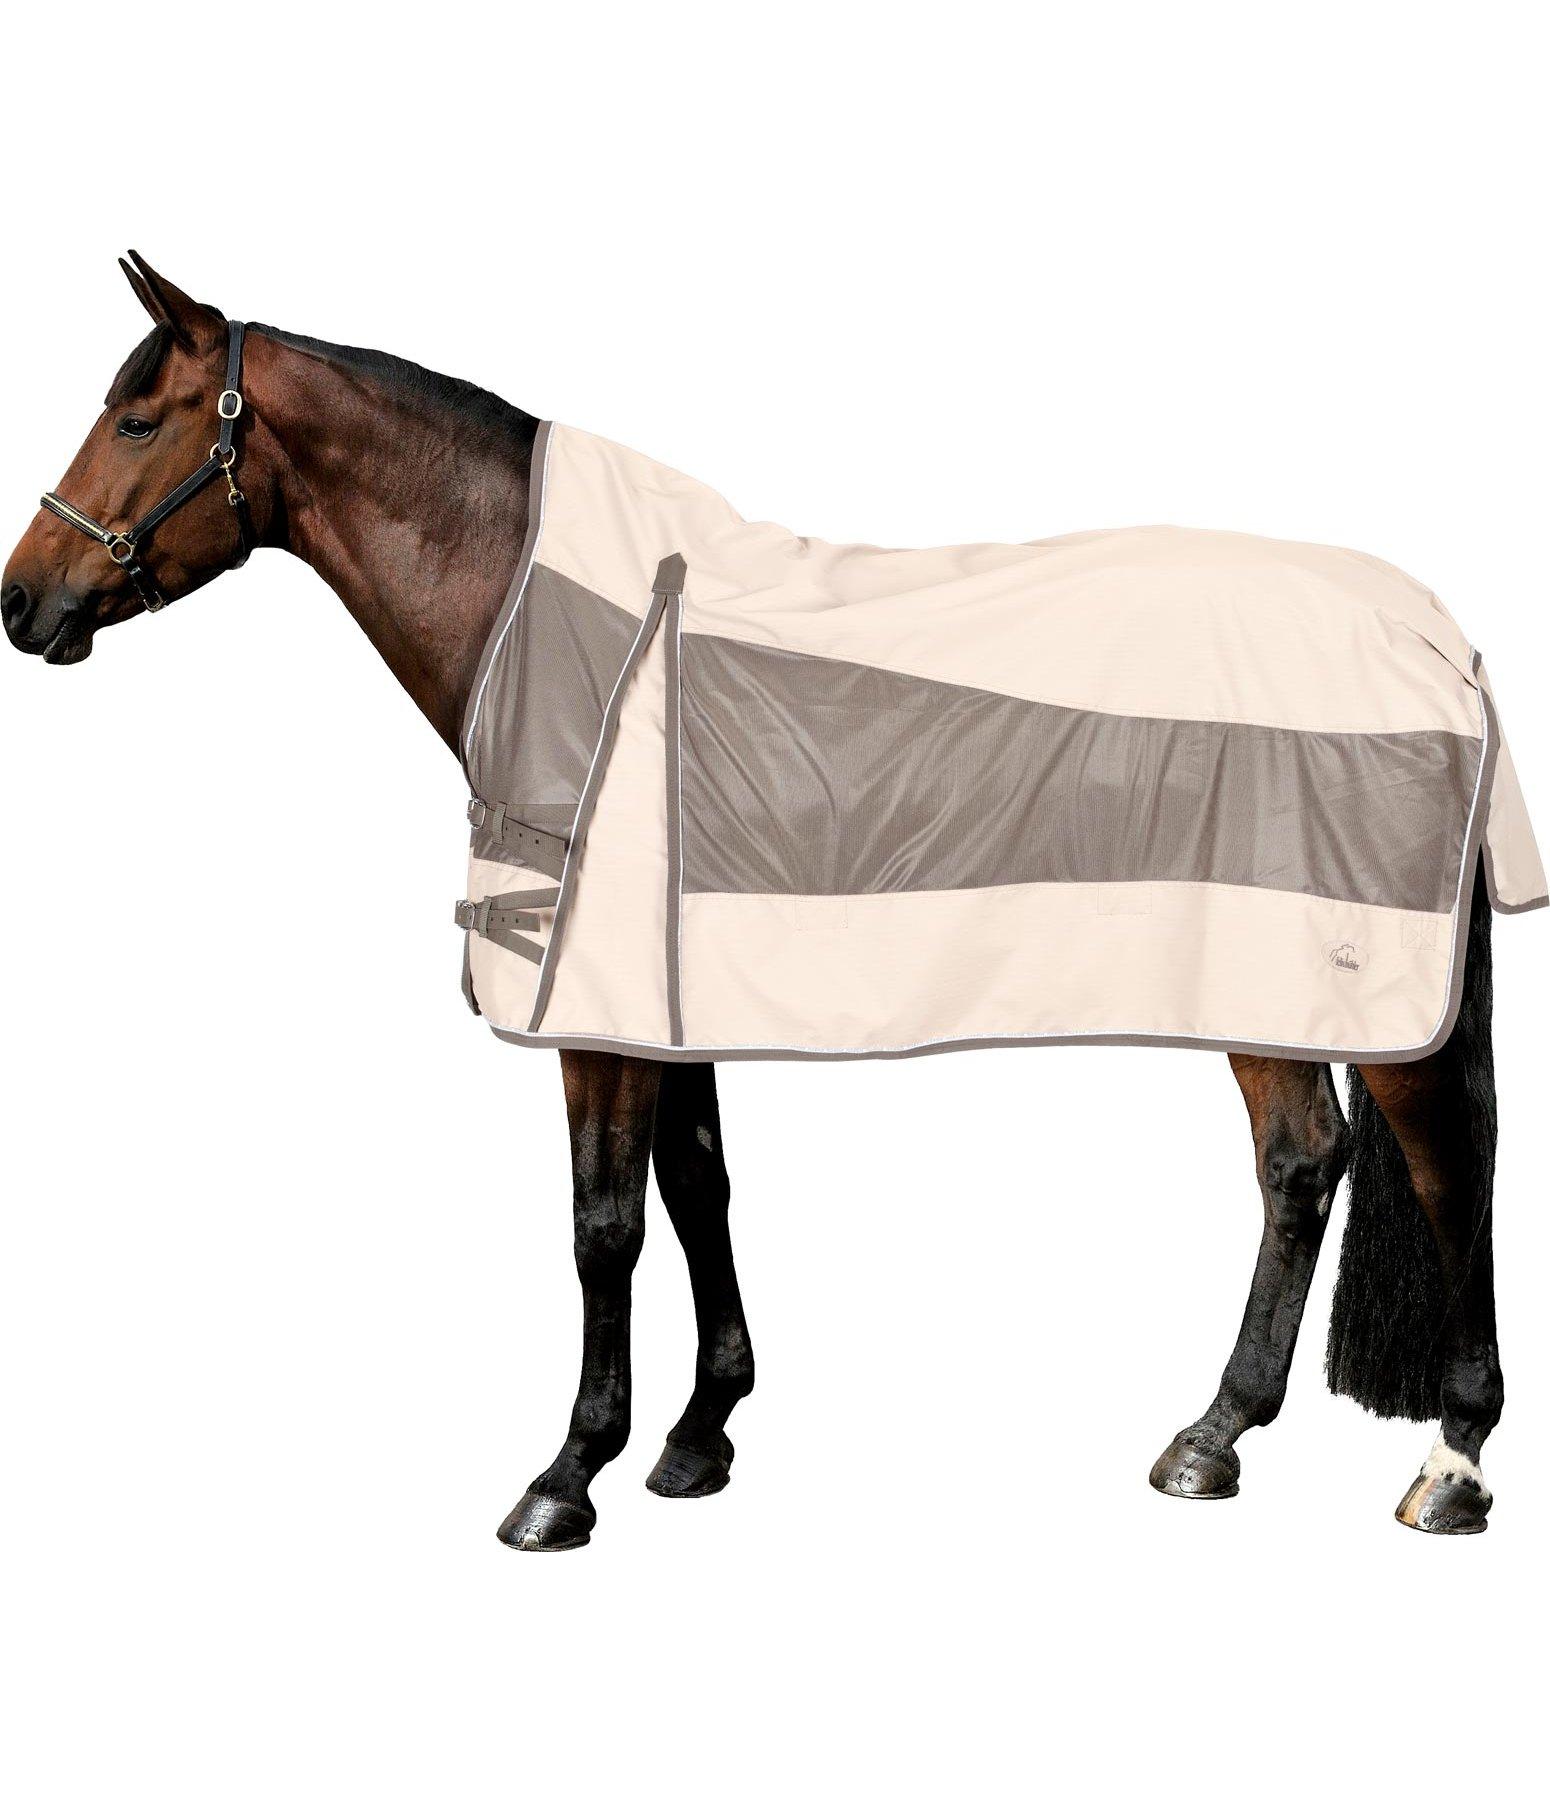 chemise d 39 ext rieur anti mouches highneck rainfly kramer. Black Bedroom Furniture Sets. Home Design Ideas